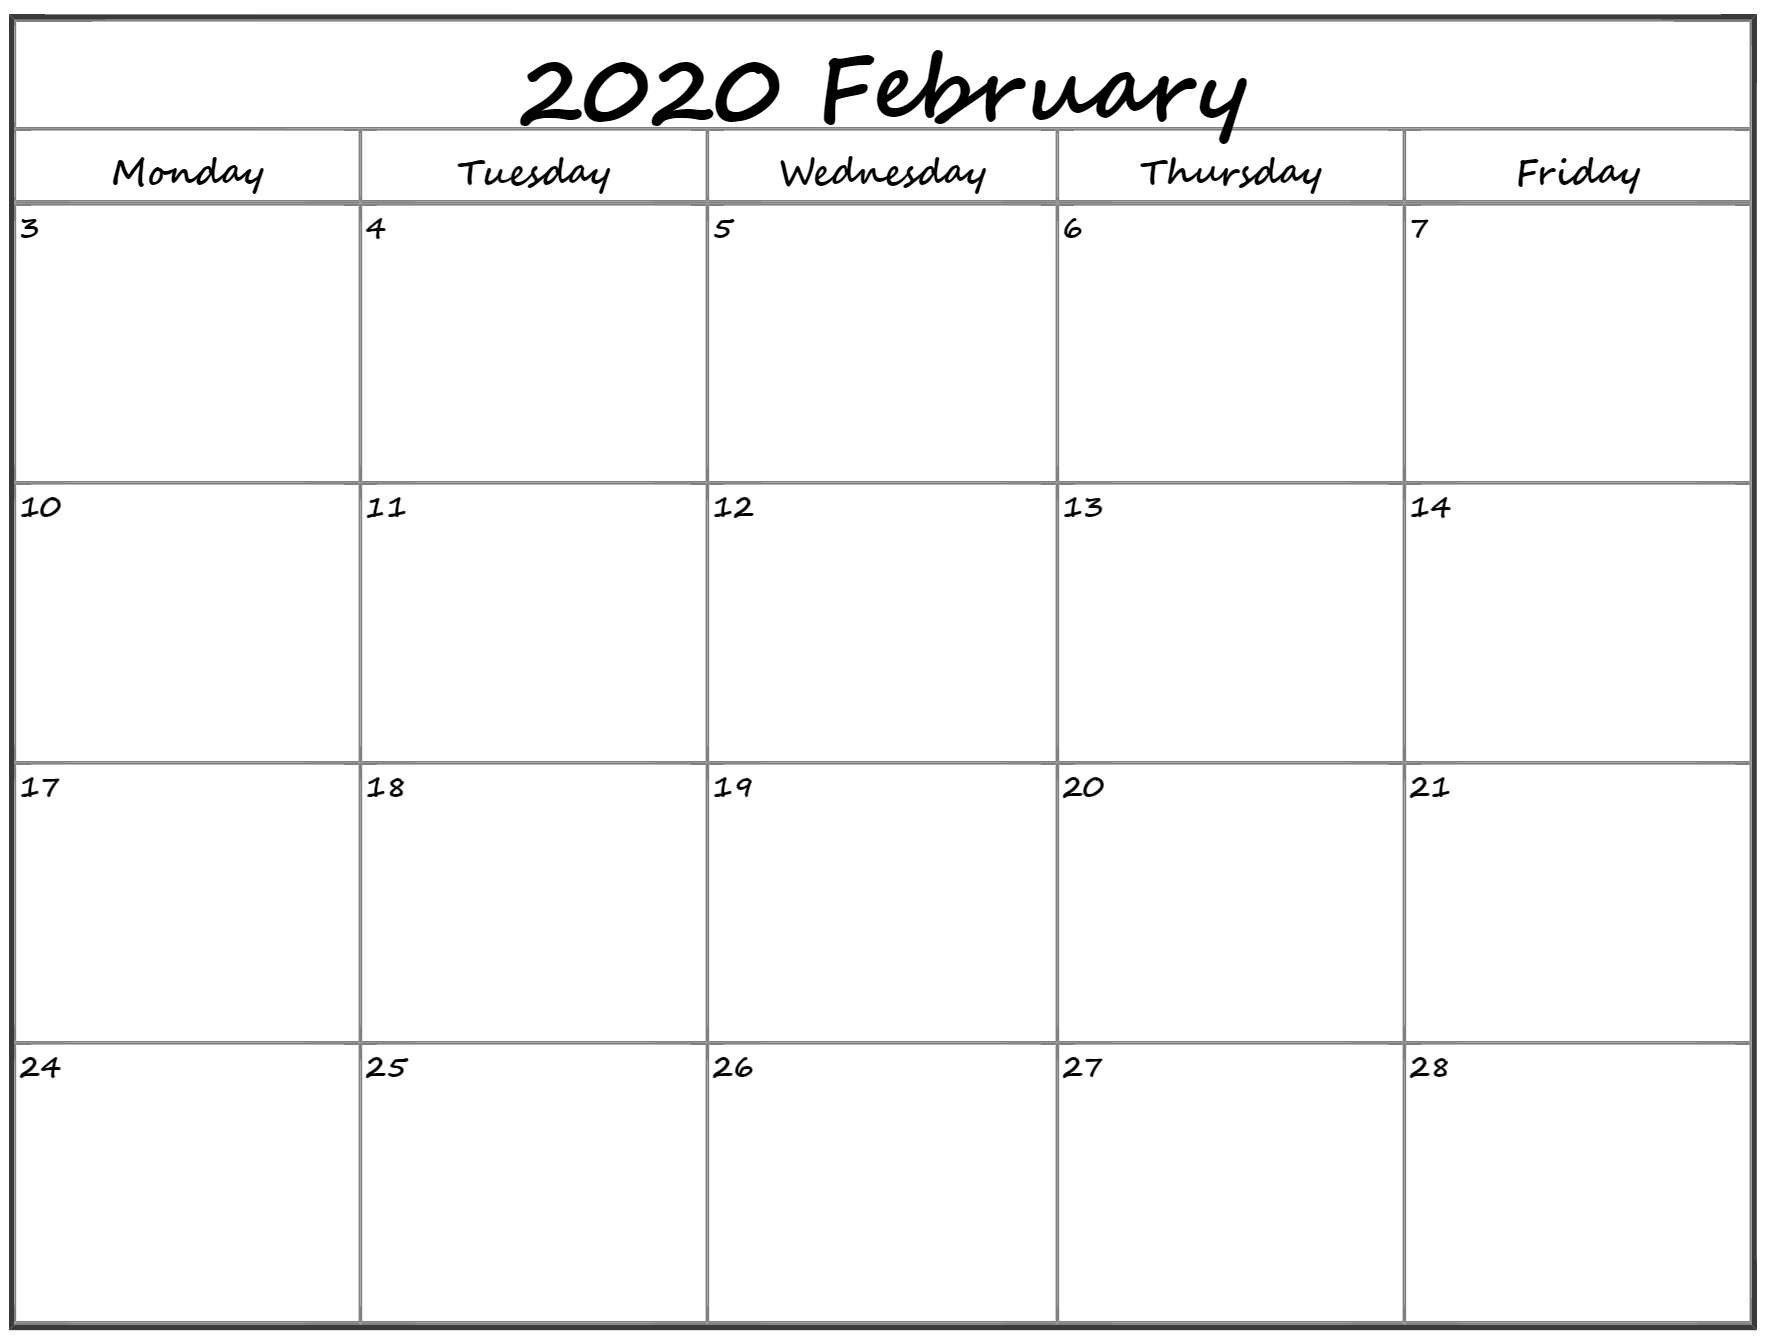 February 2020 Monday Calendar | Monday To Sunday Printable Monday Through Friday Monthly Calendar Free